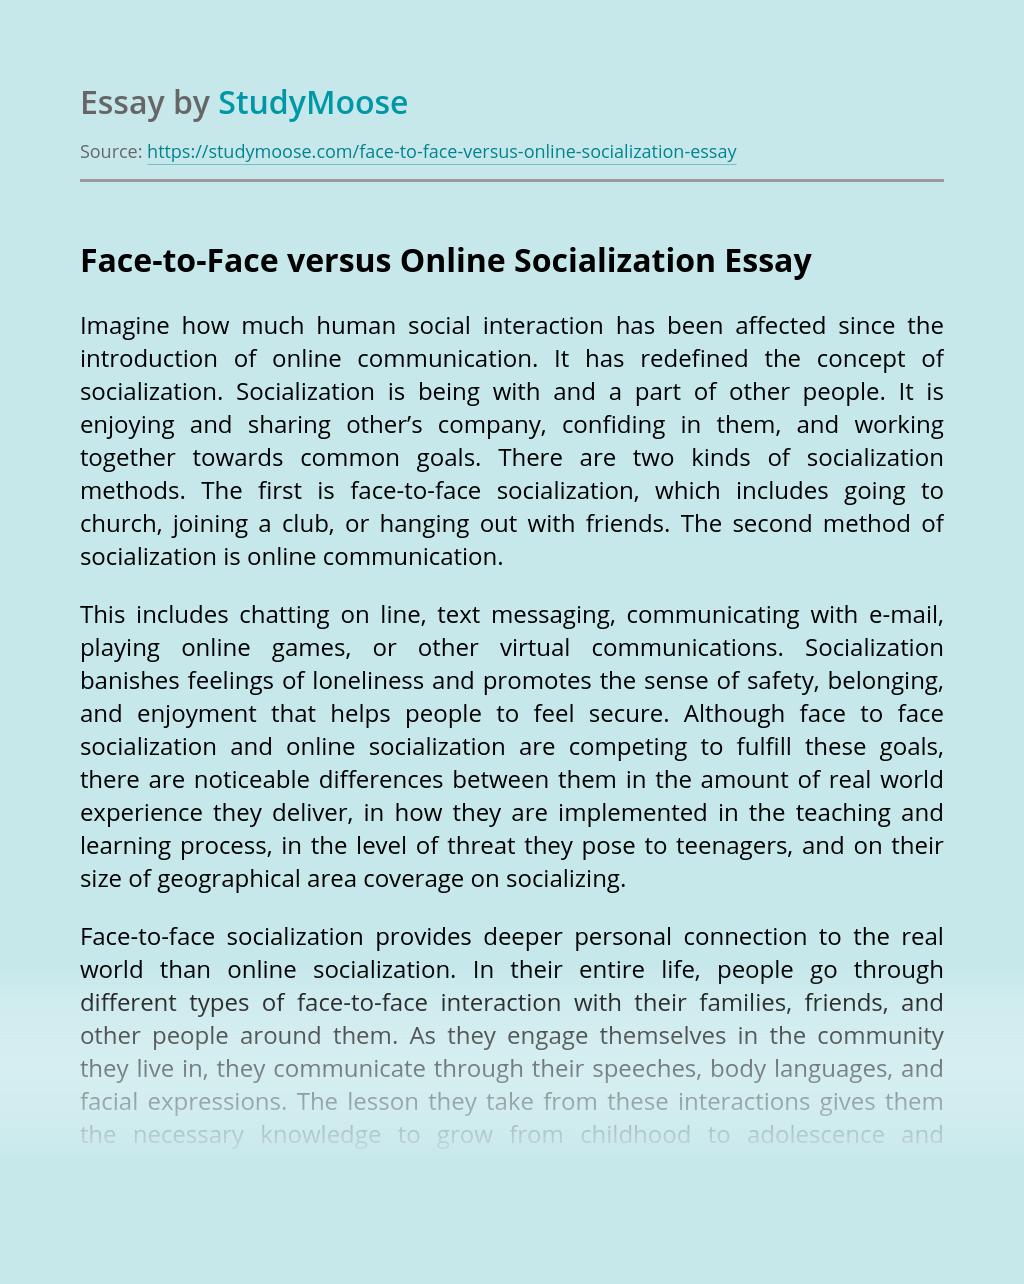 Face-to-Face versus Online Socialization